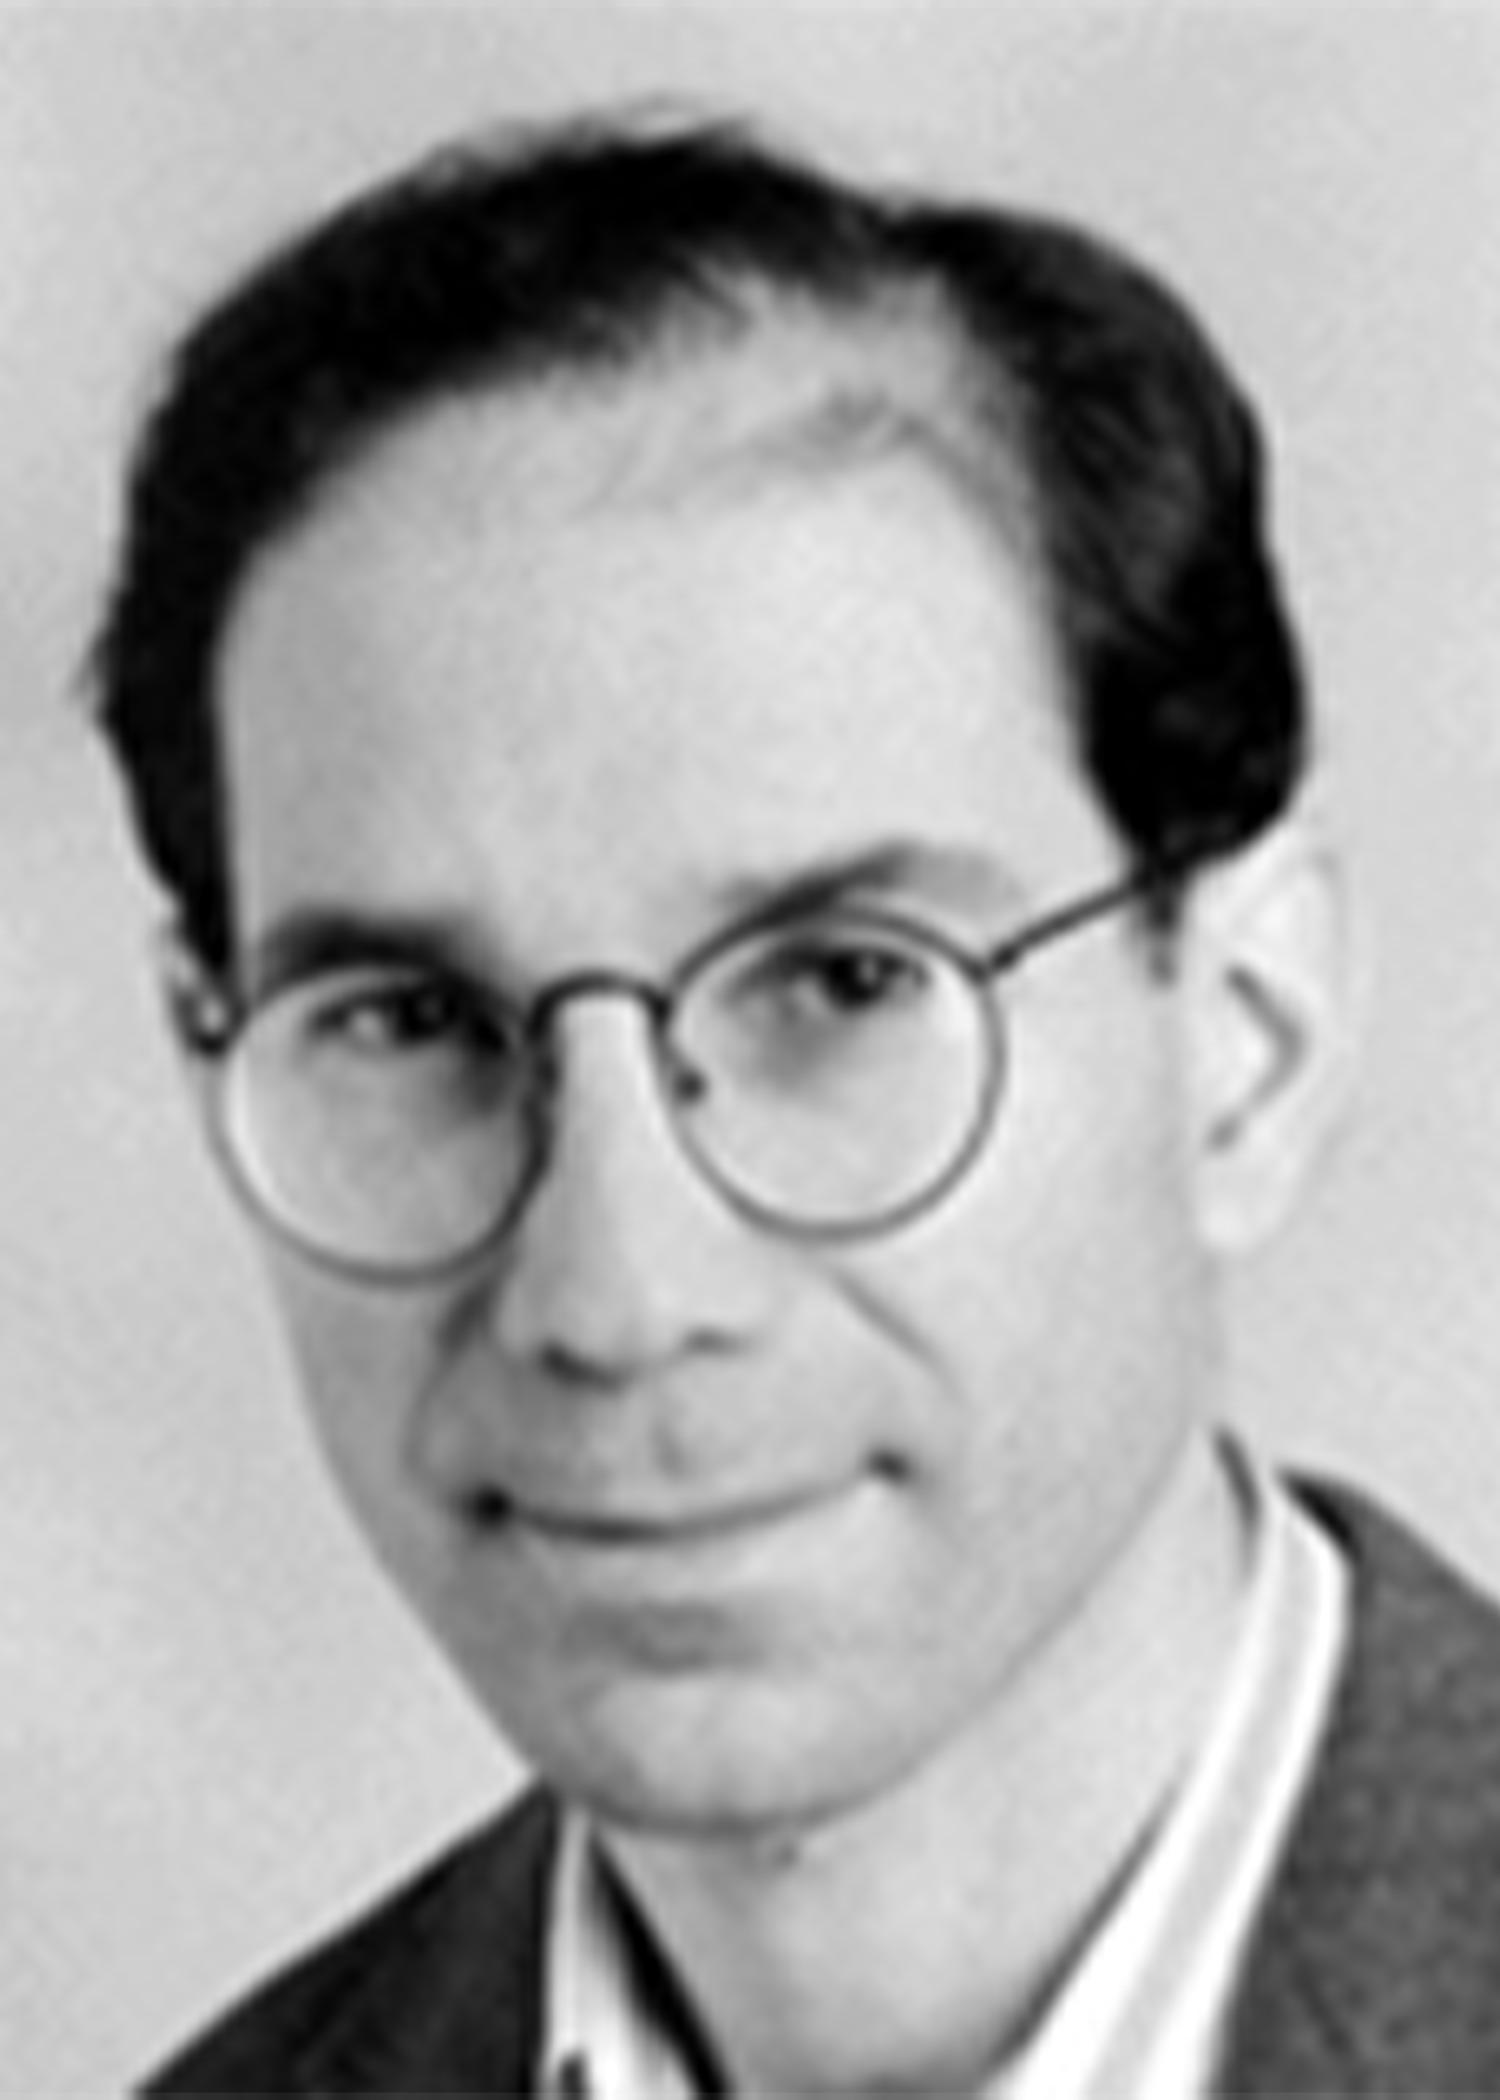 Paul Zarowin Headshot